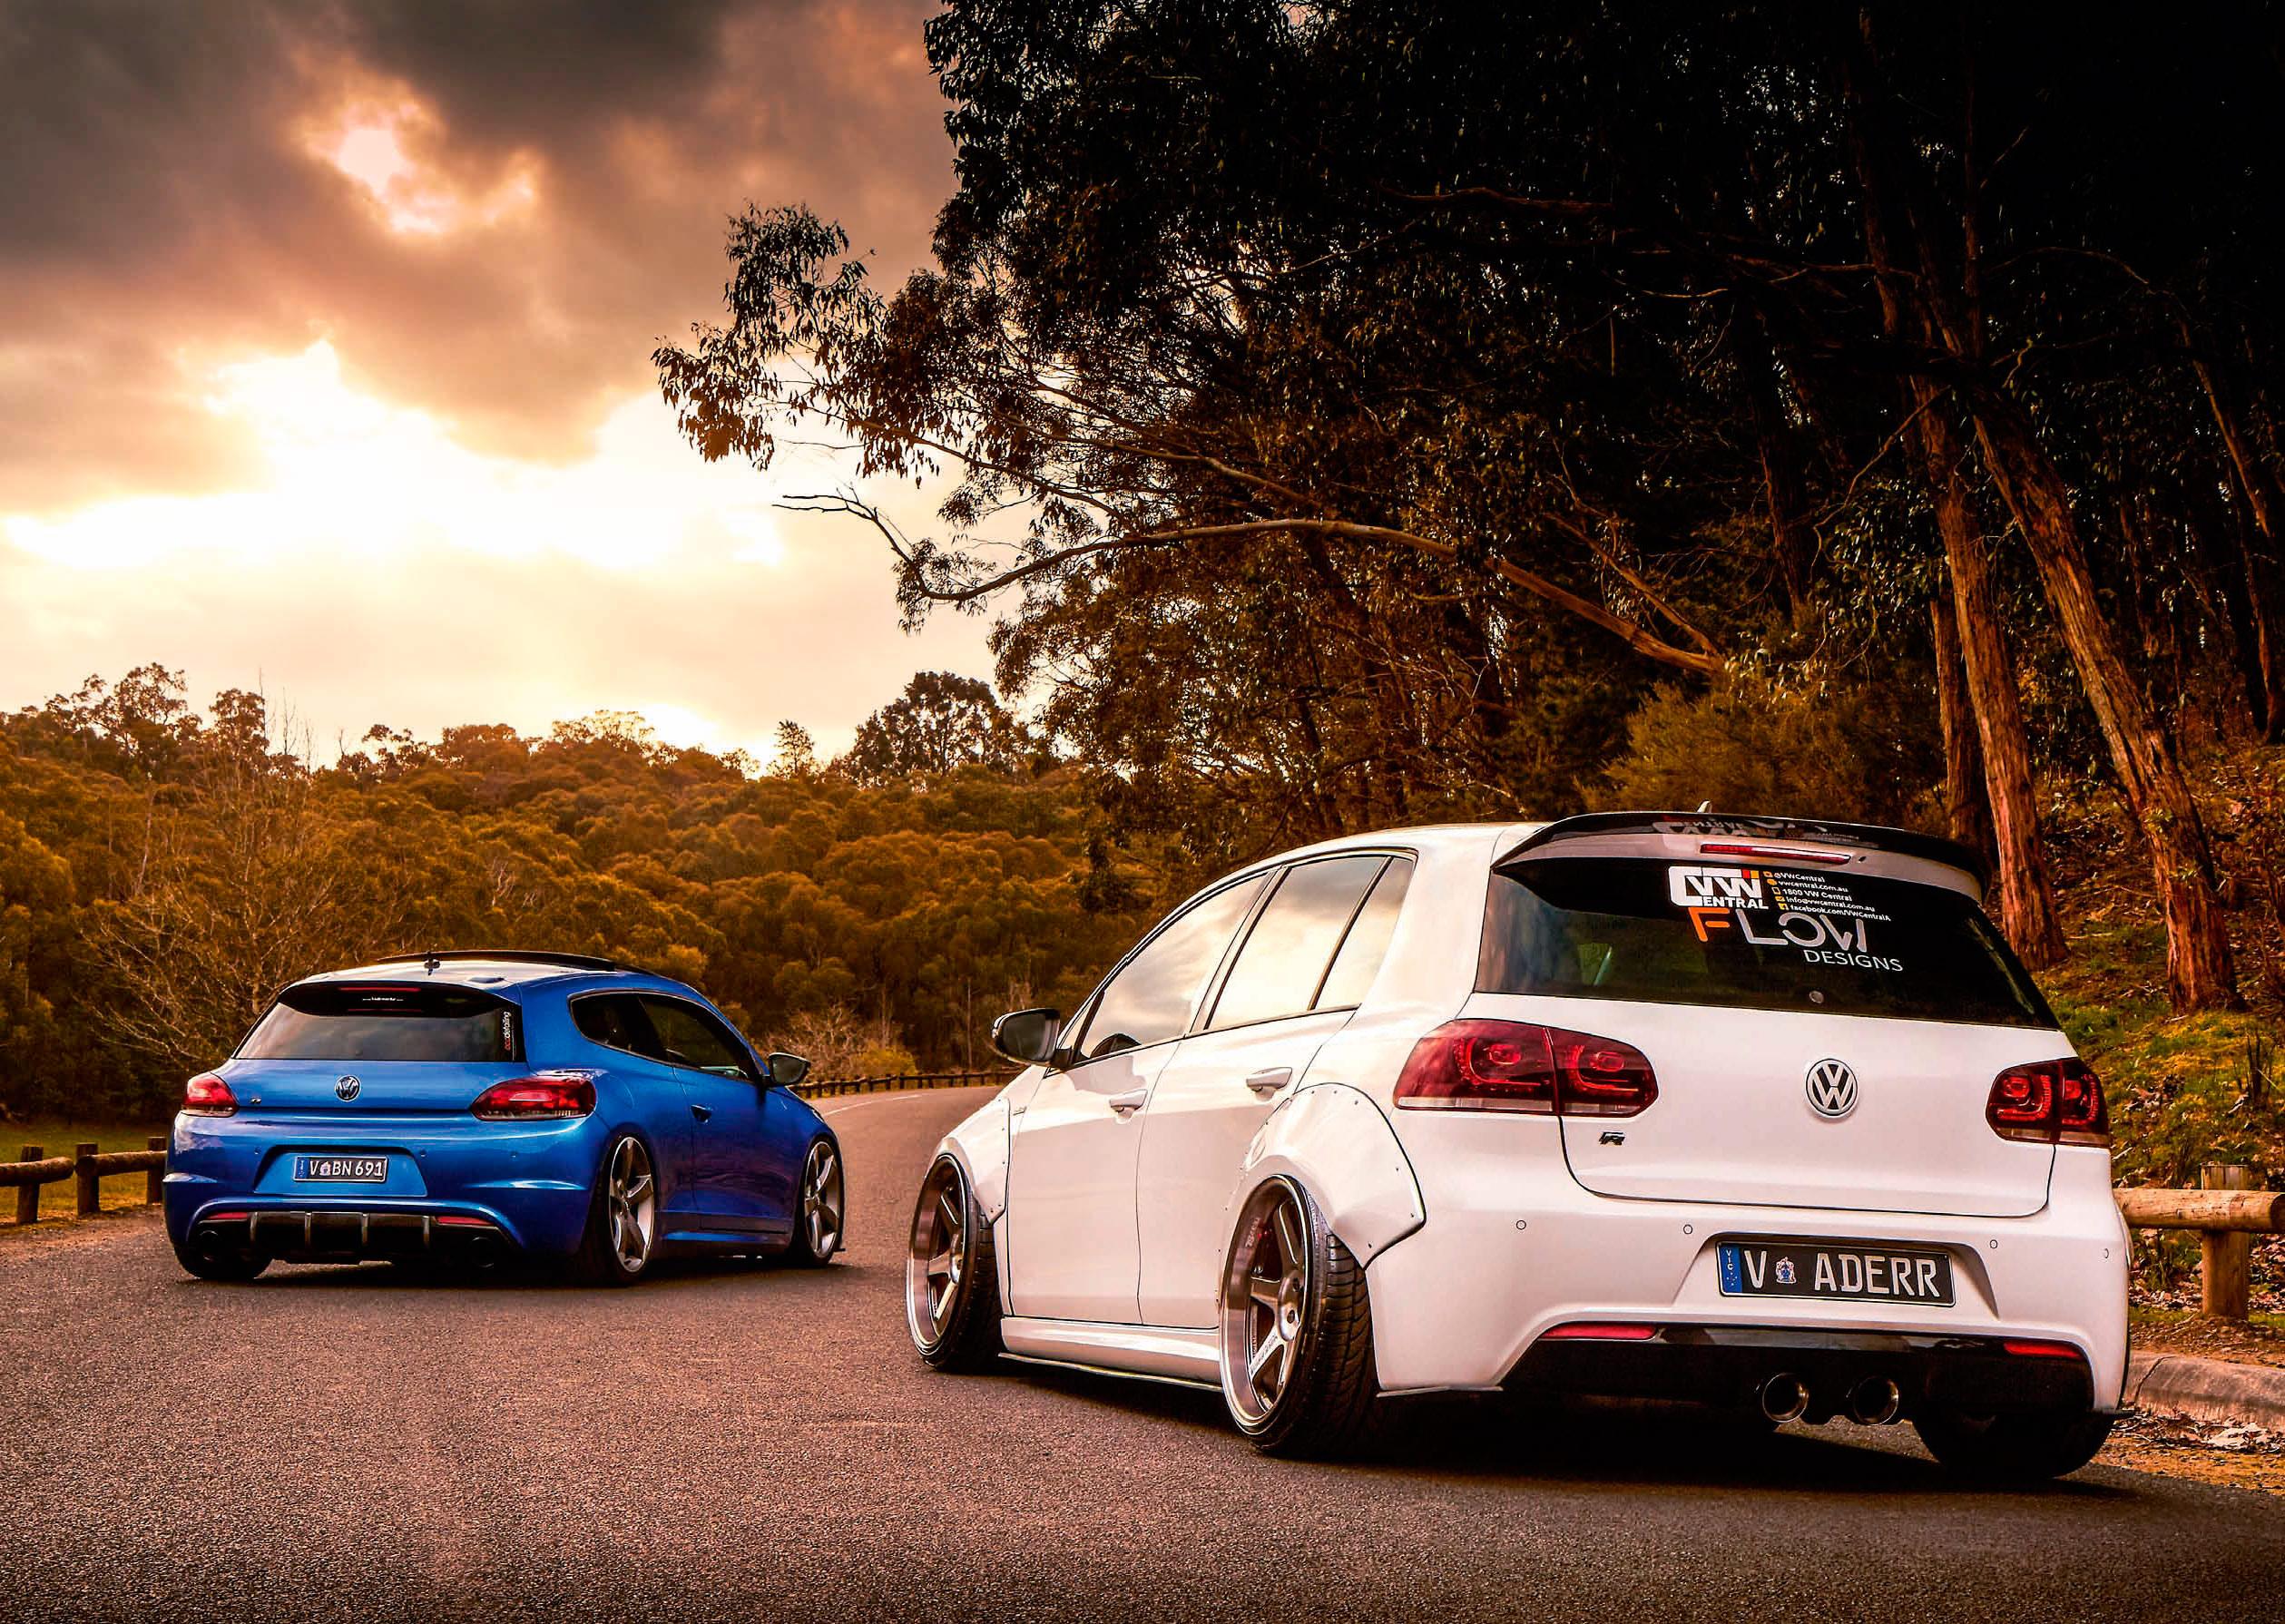 Vw golf r mk6 cars one love - Volkswagen Golf R Mk6 Vs Volkswagen Scirocco R Mk3